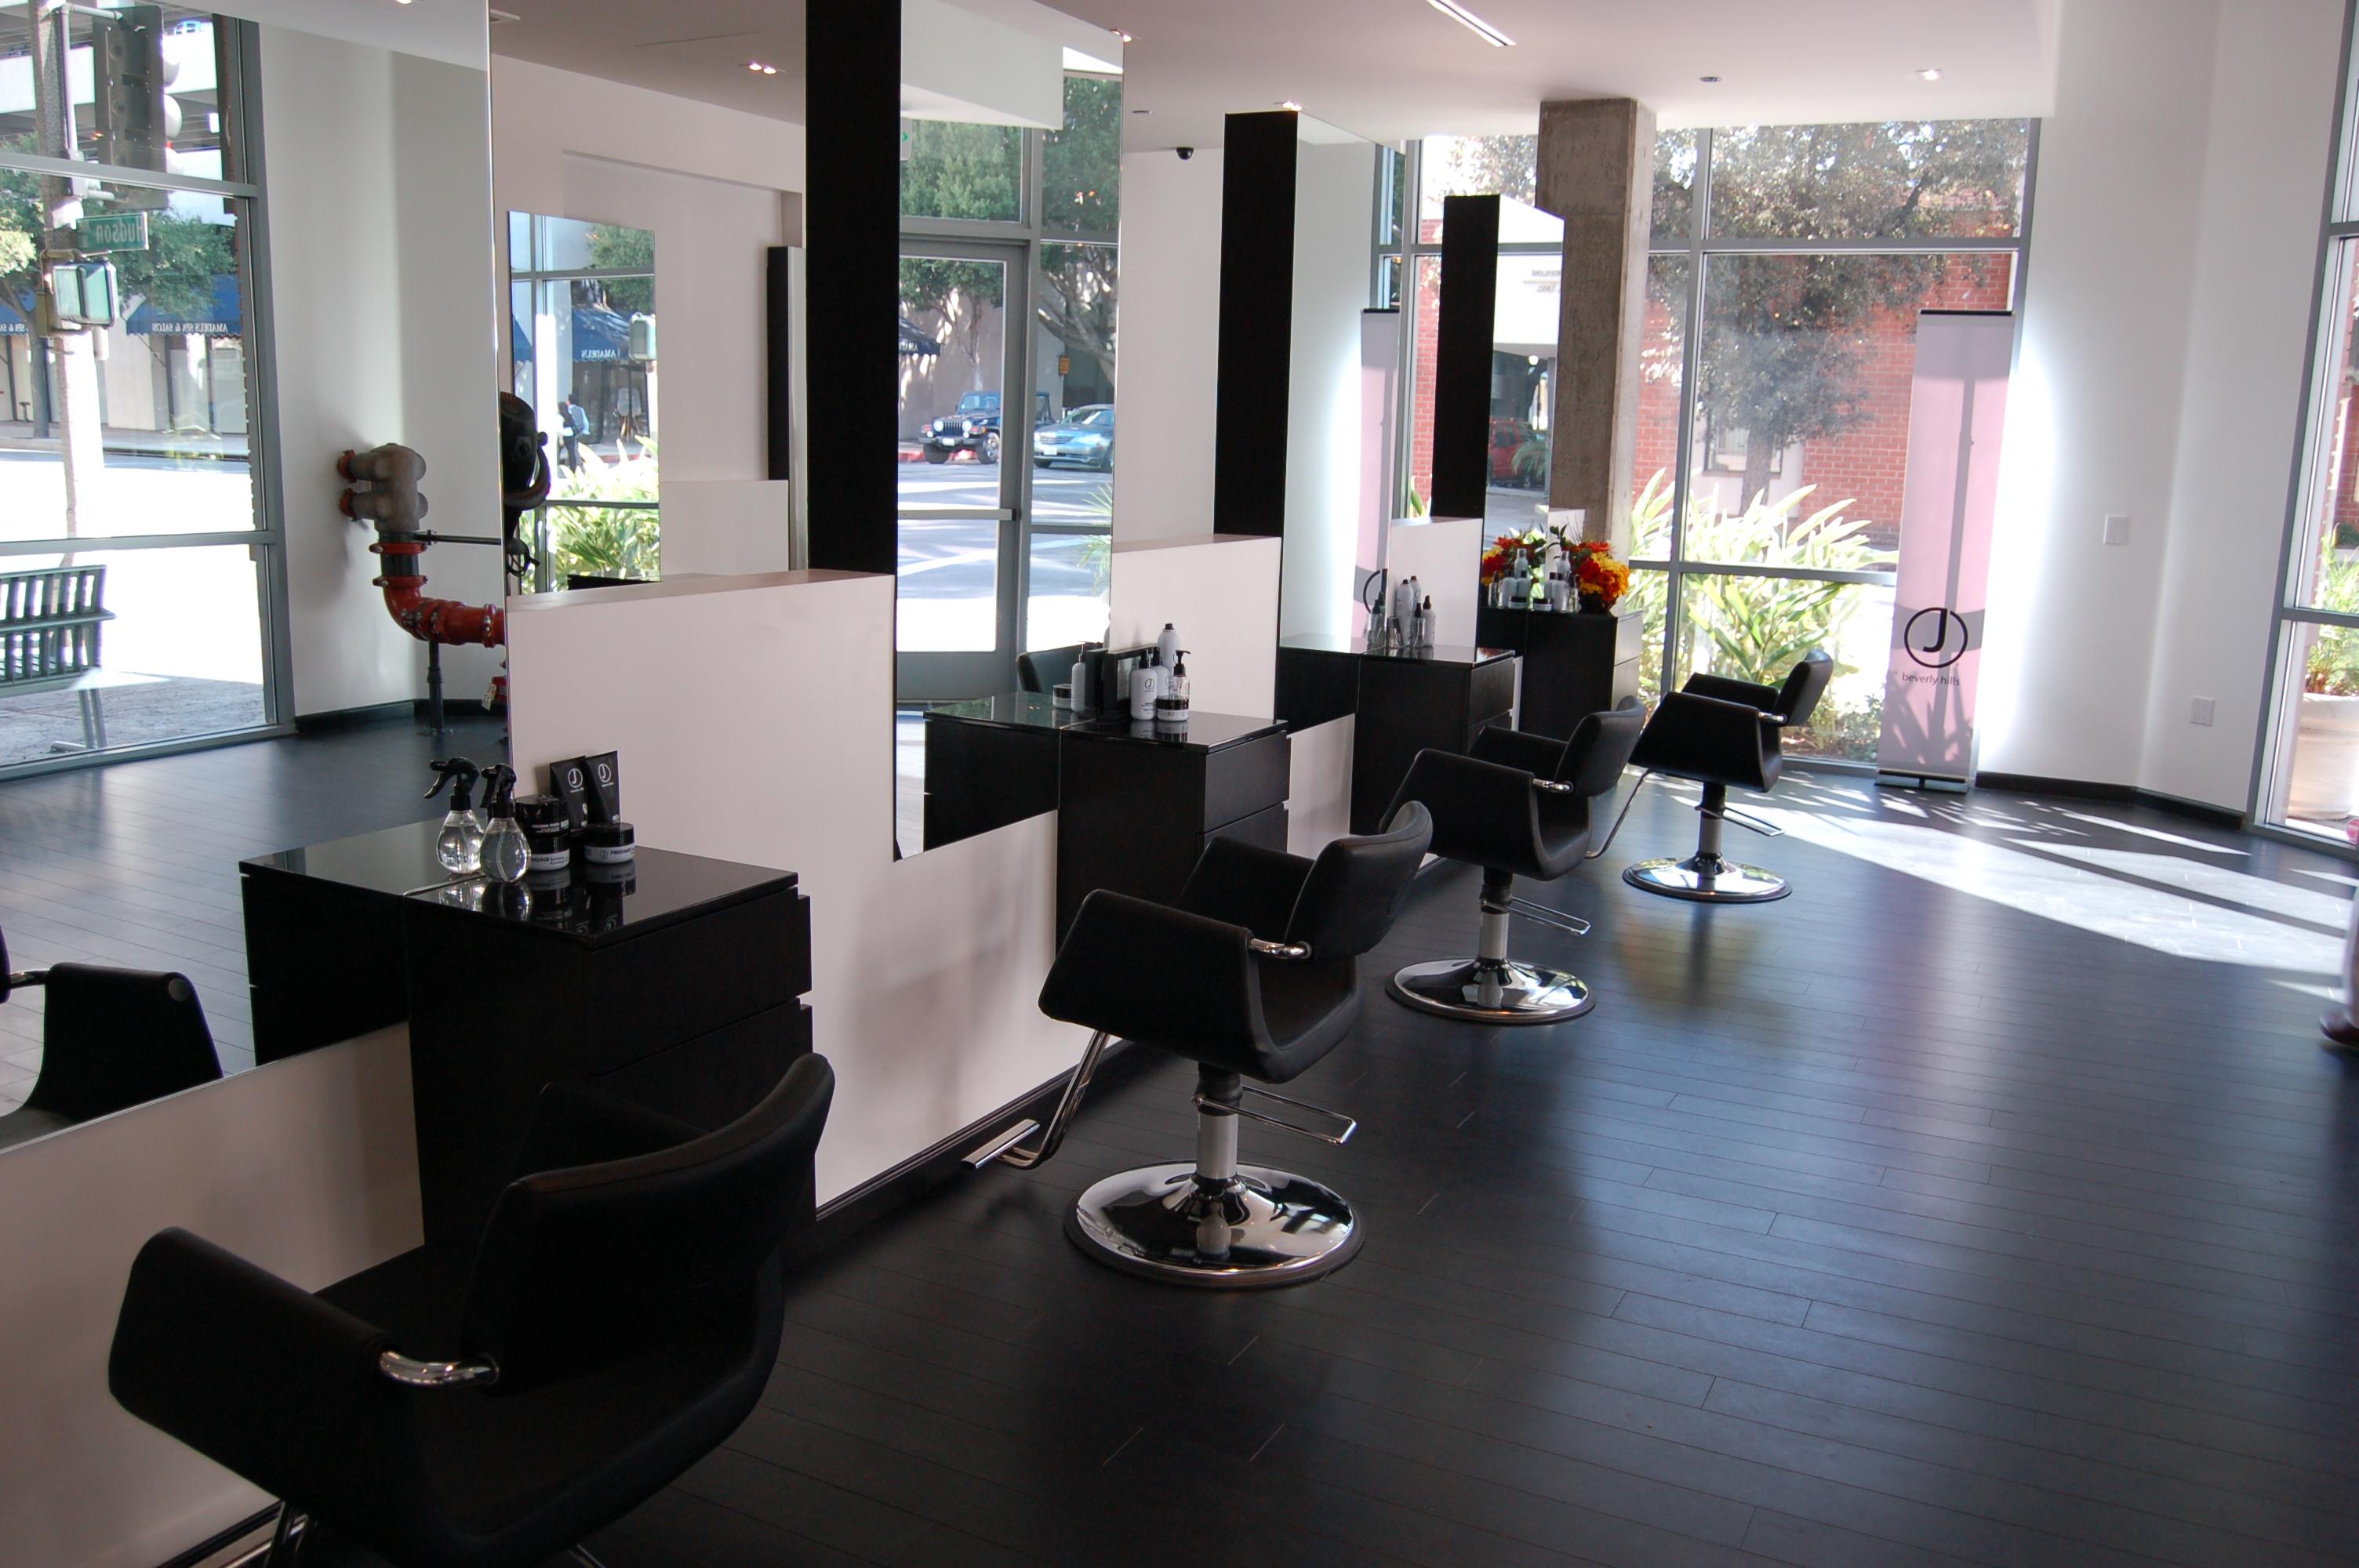 Surprising Look 4 Design Salon Chaios Com Hairstyles For Men Maxibearus